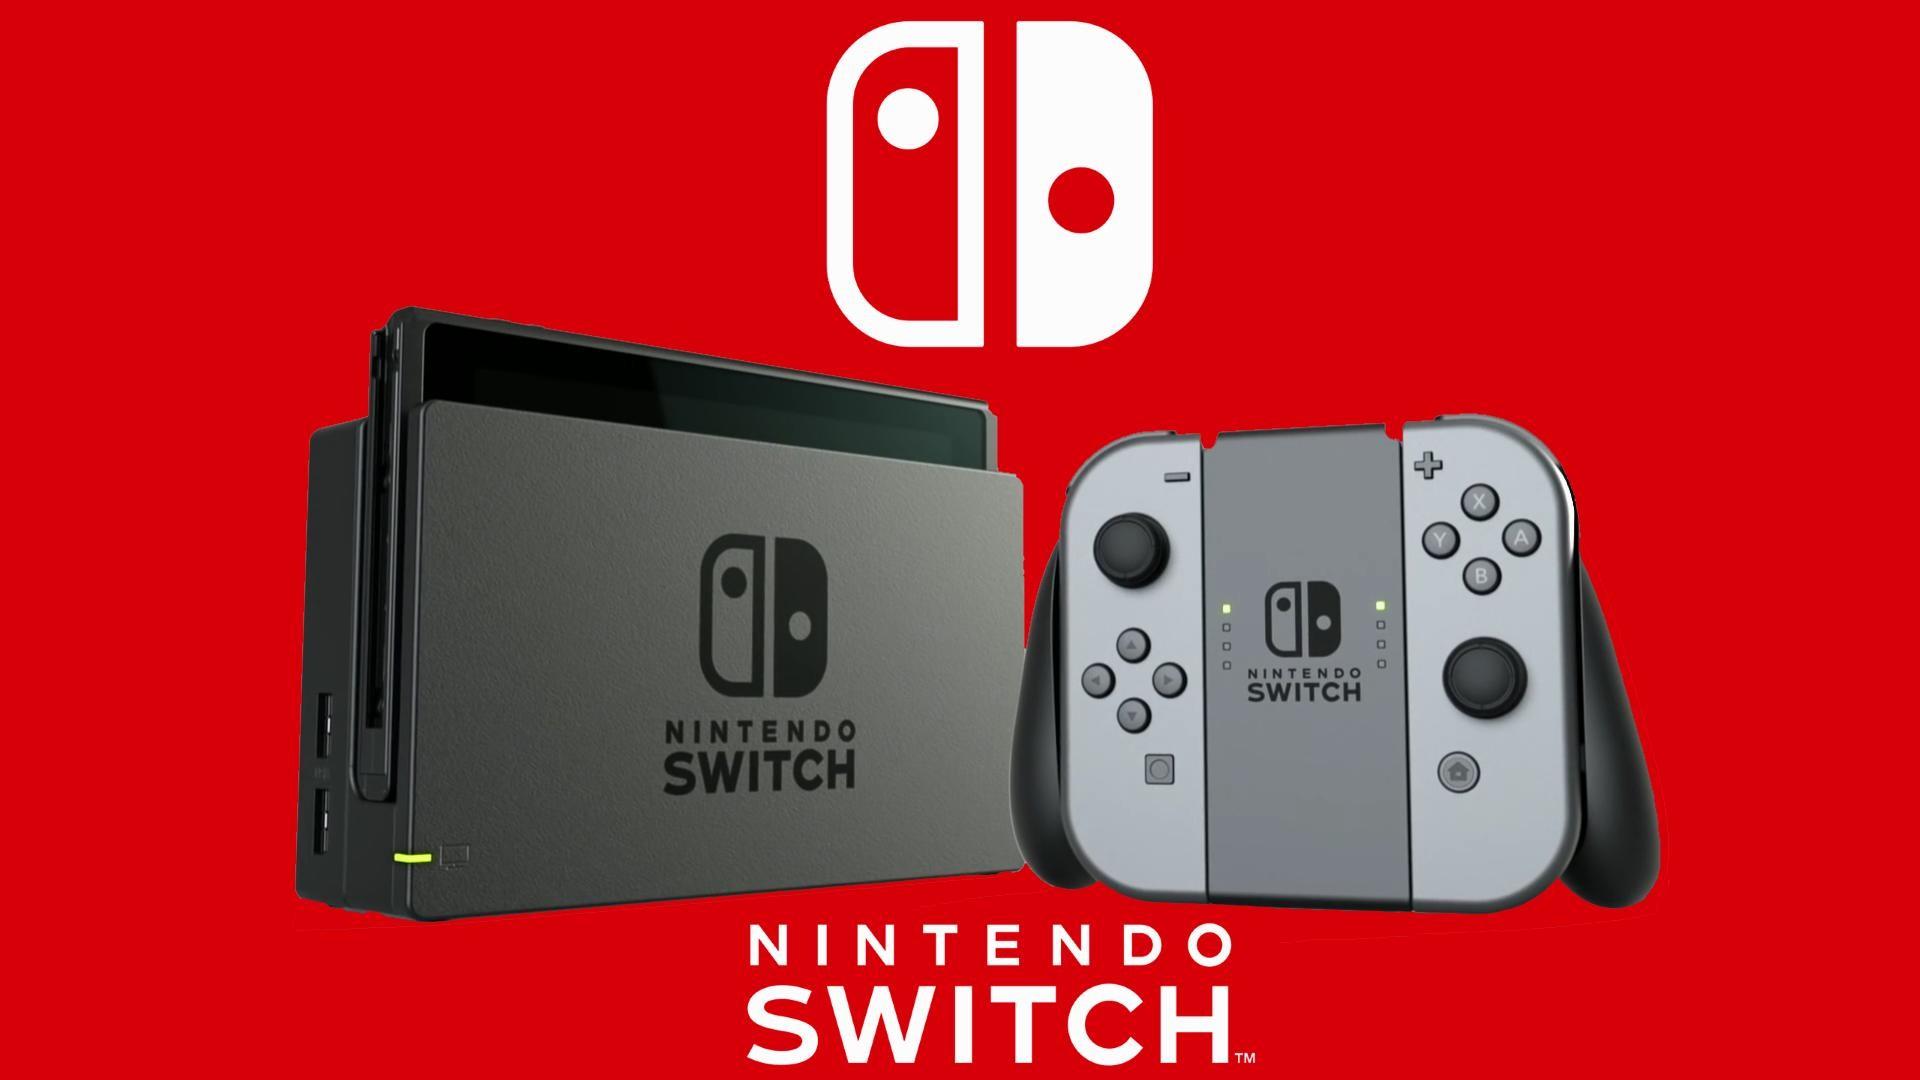 1920x1080, Nintendo Switch Console Background Need - Boy Nintendo Switch Backpack - HD Wallpaper